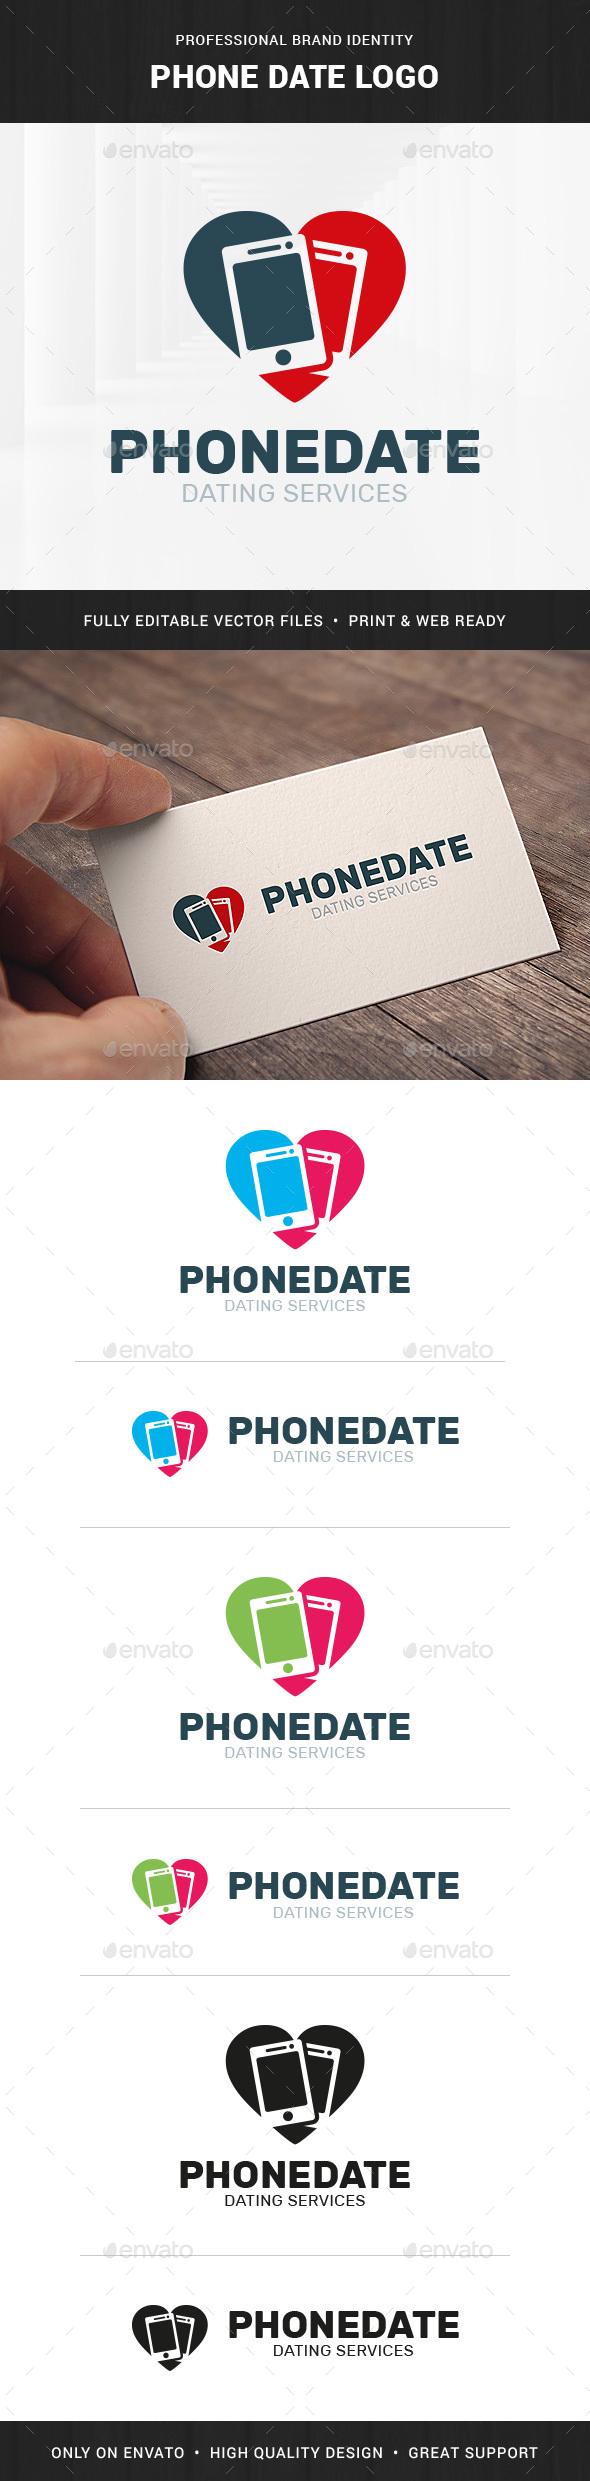 Phone Date Logo Template